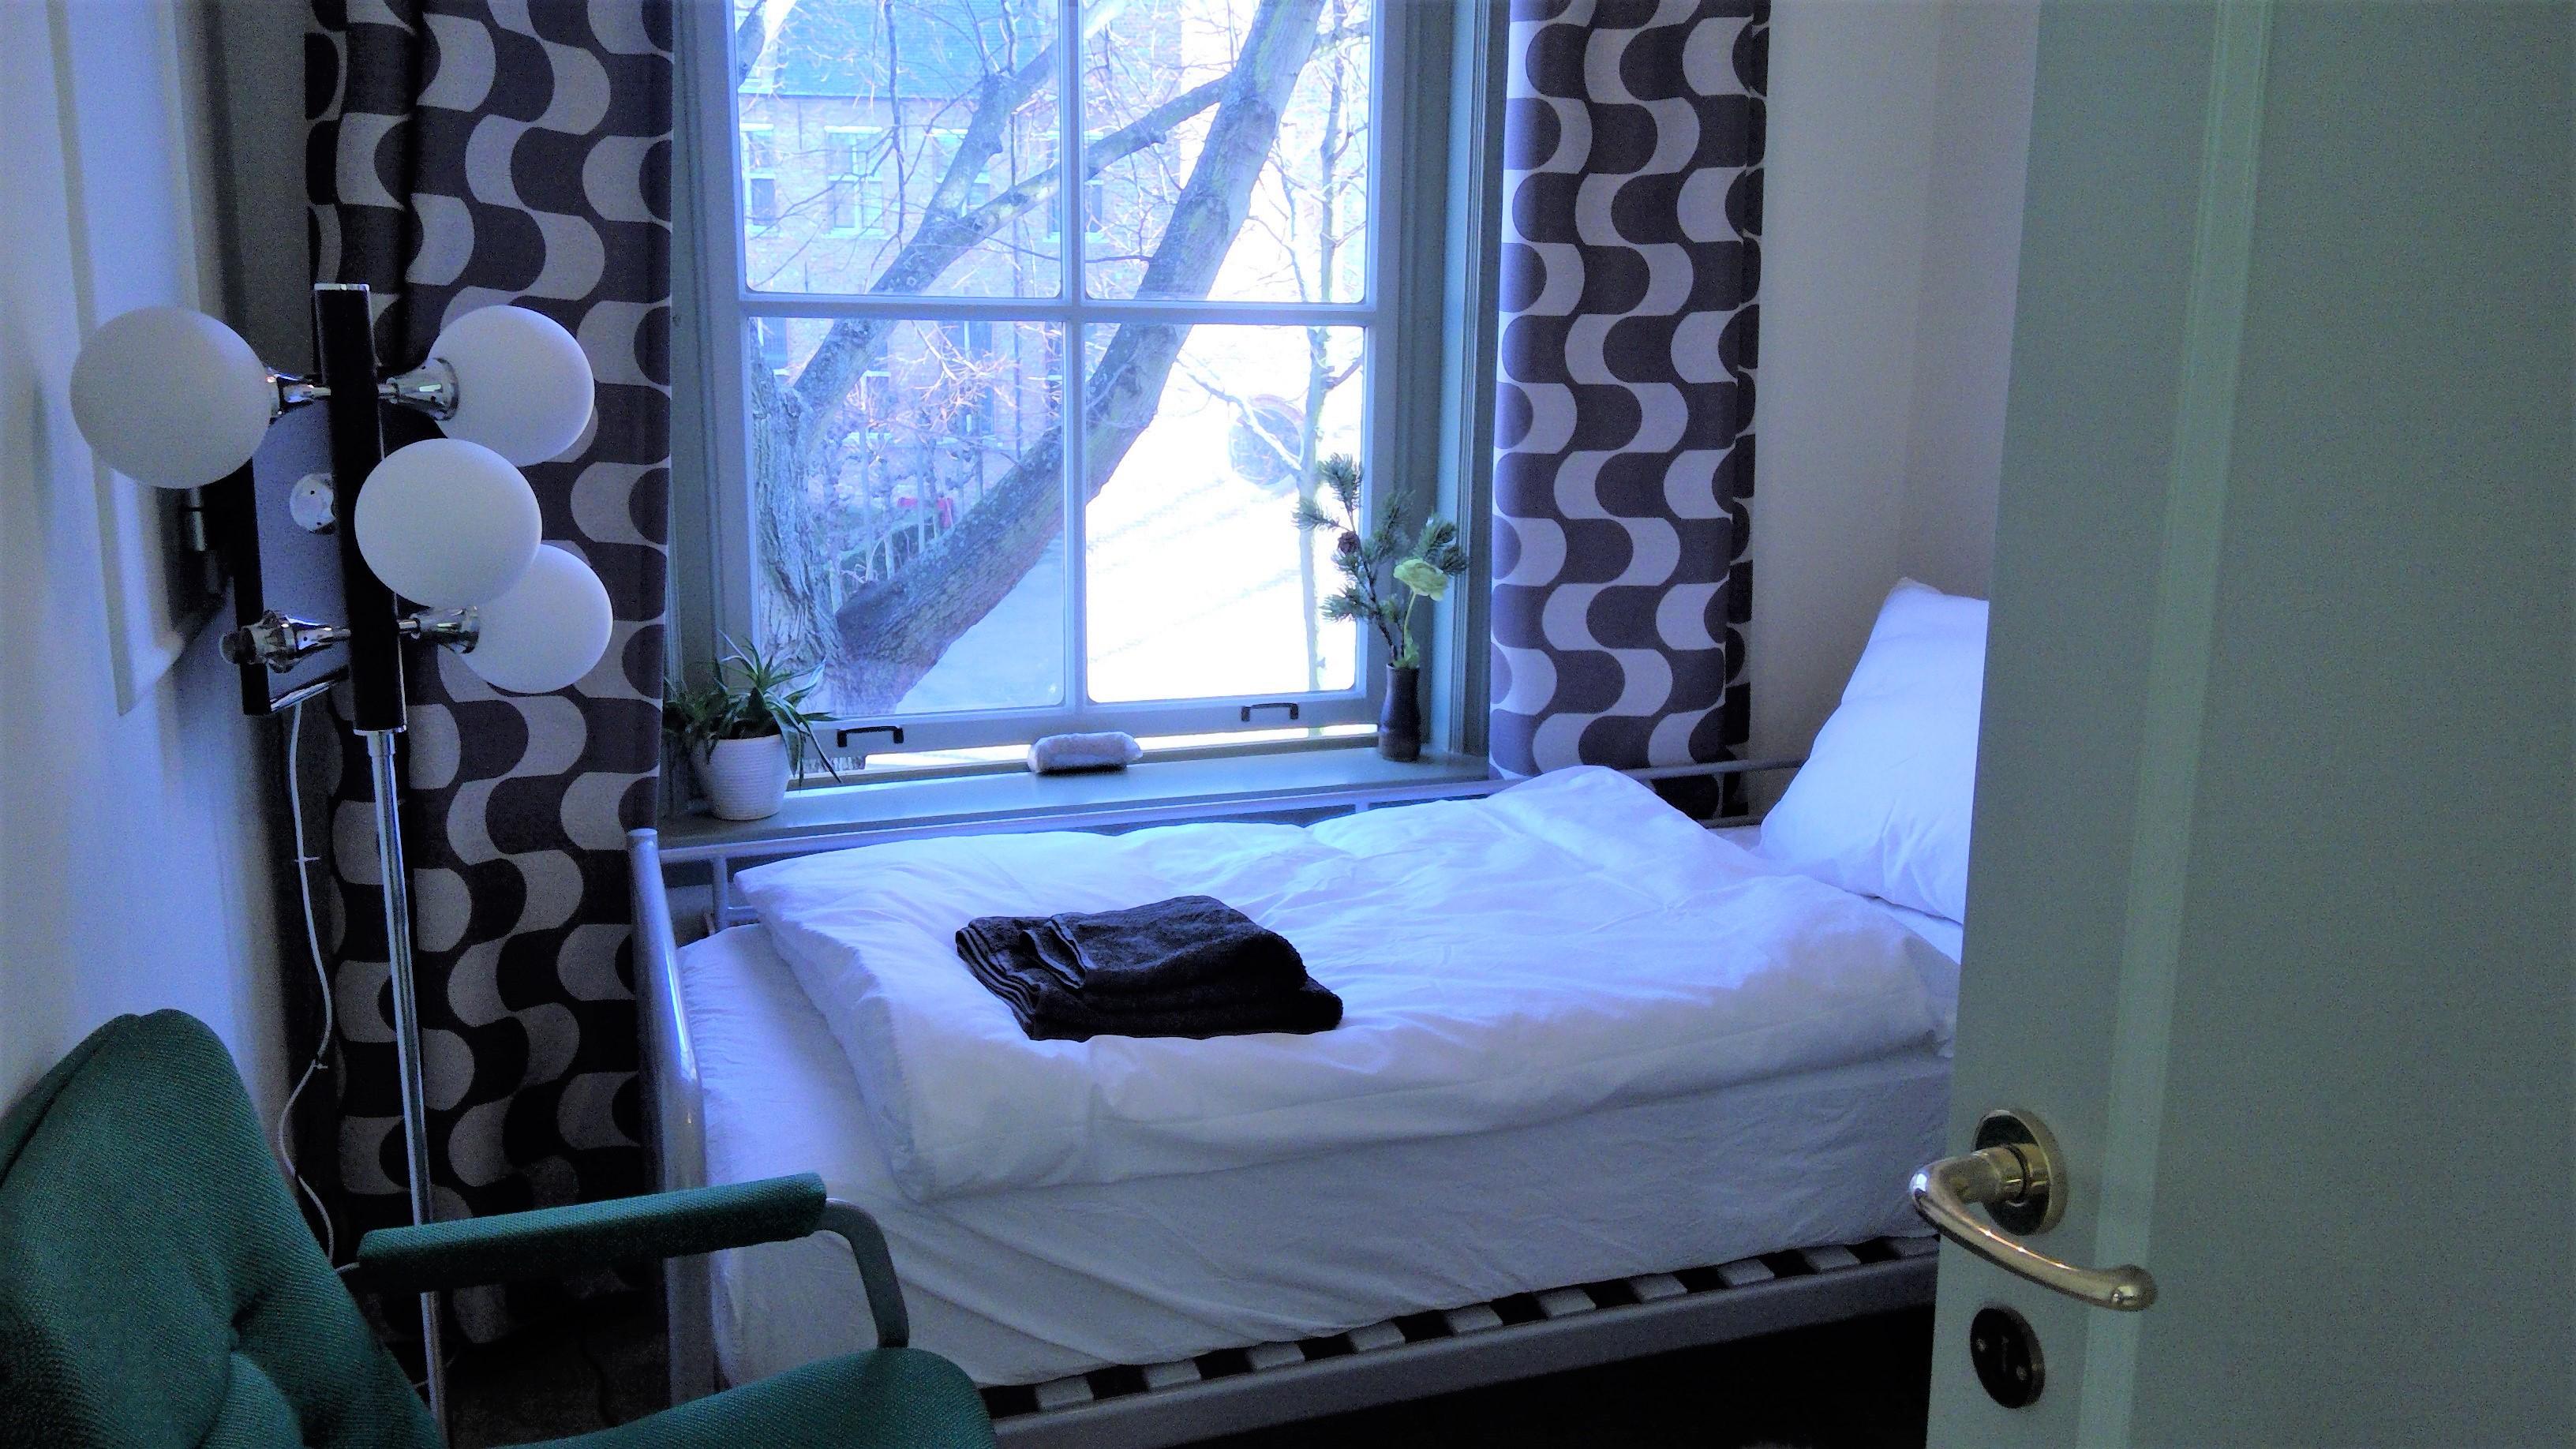 1persoonskamer met comfortabel bed